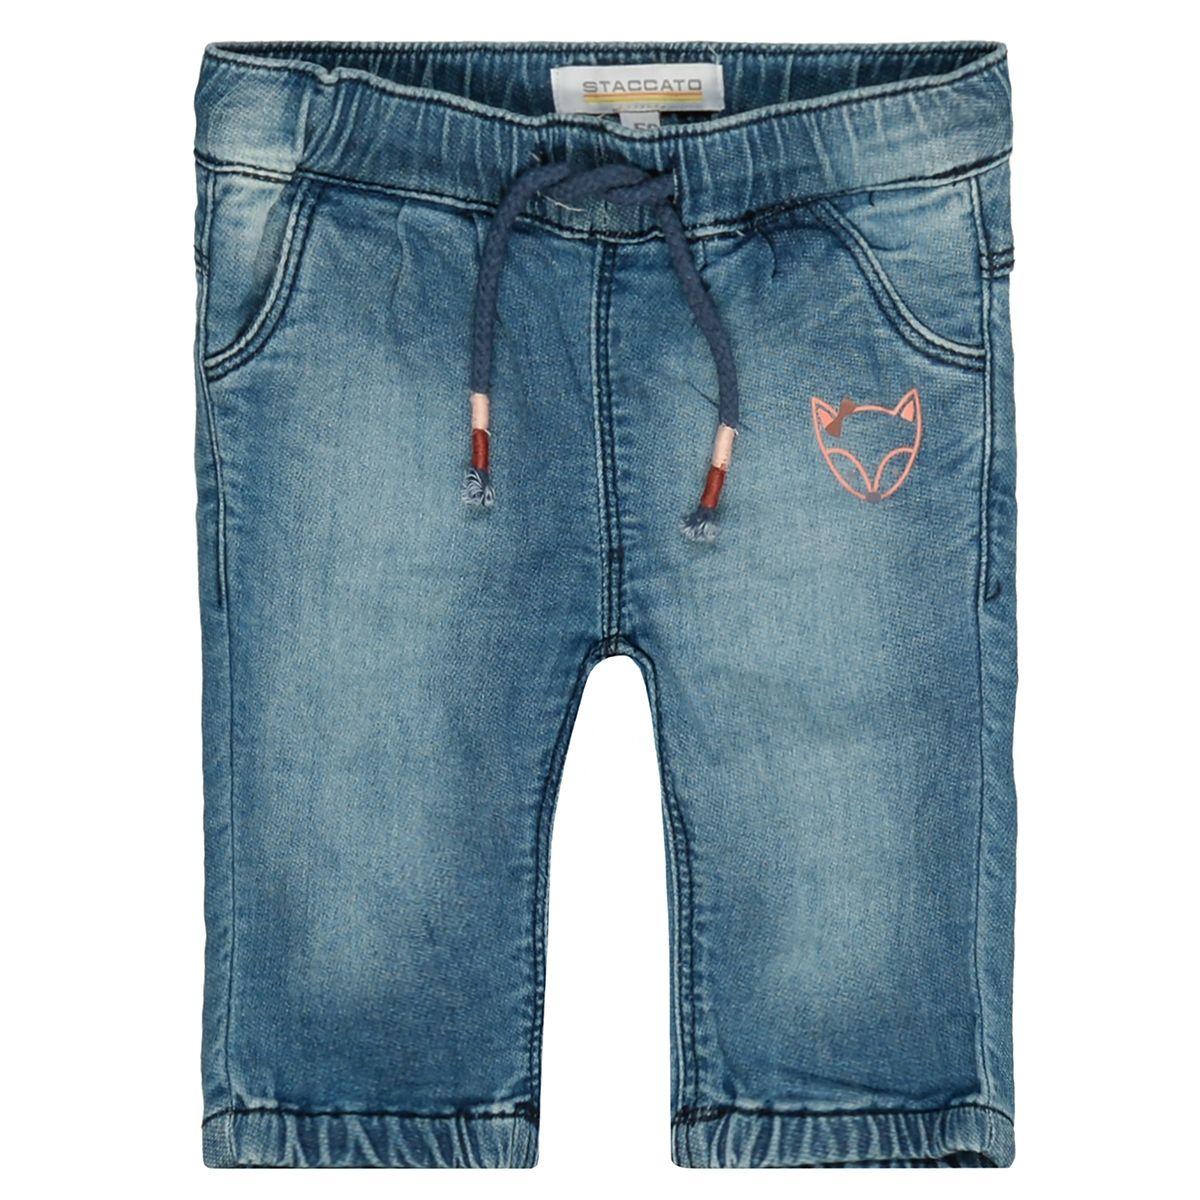 Jeans mit Print-Detail - Mid Blue Denim